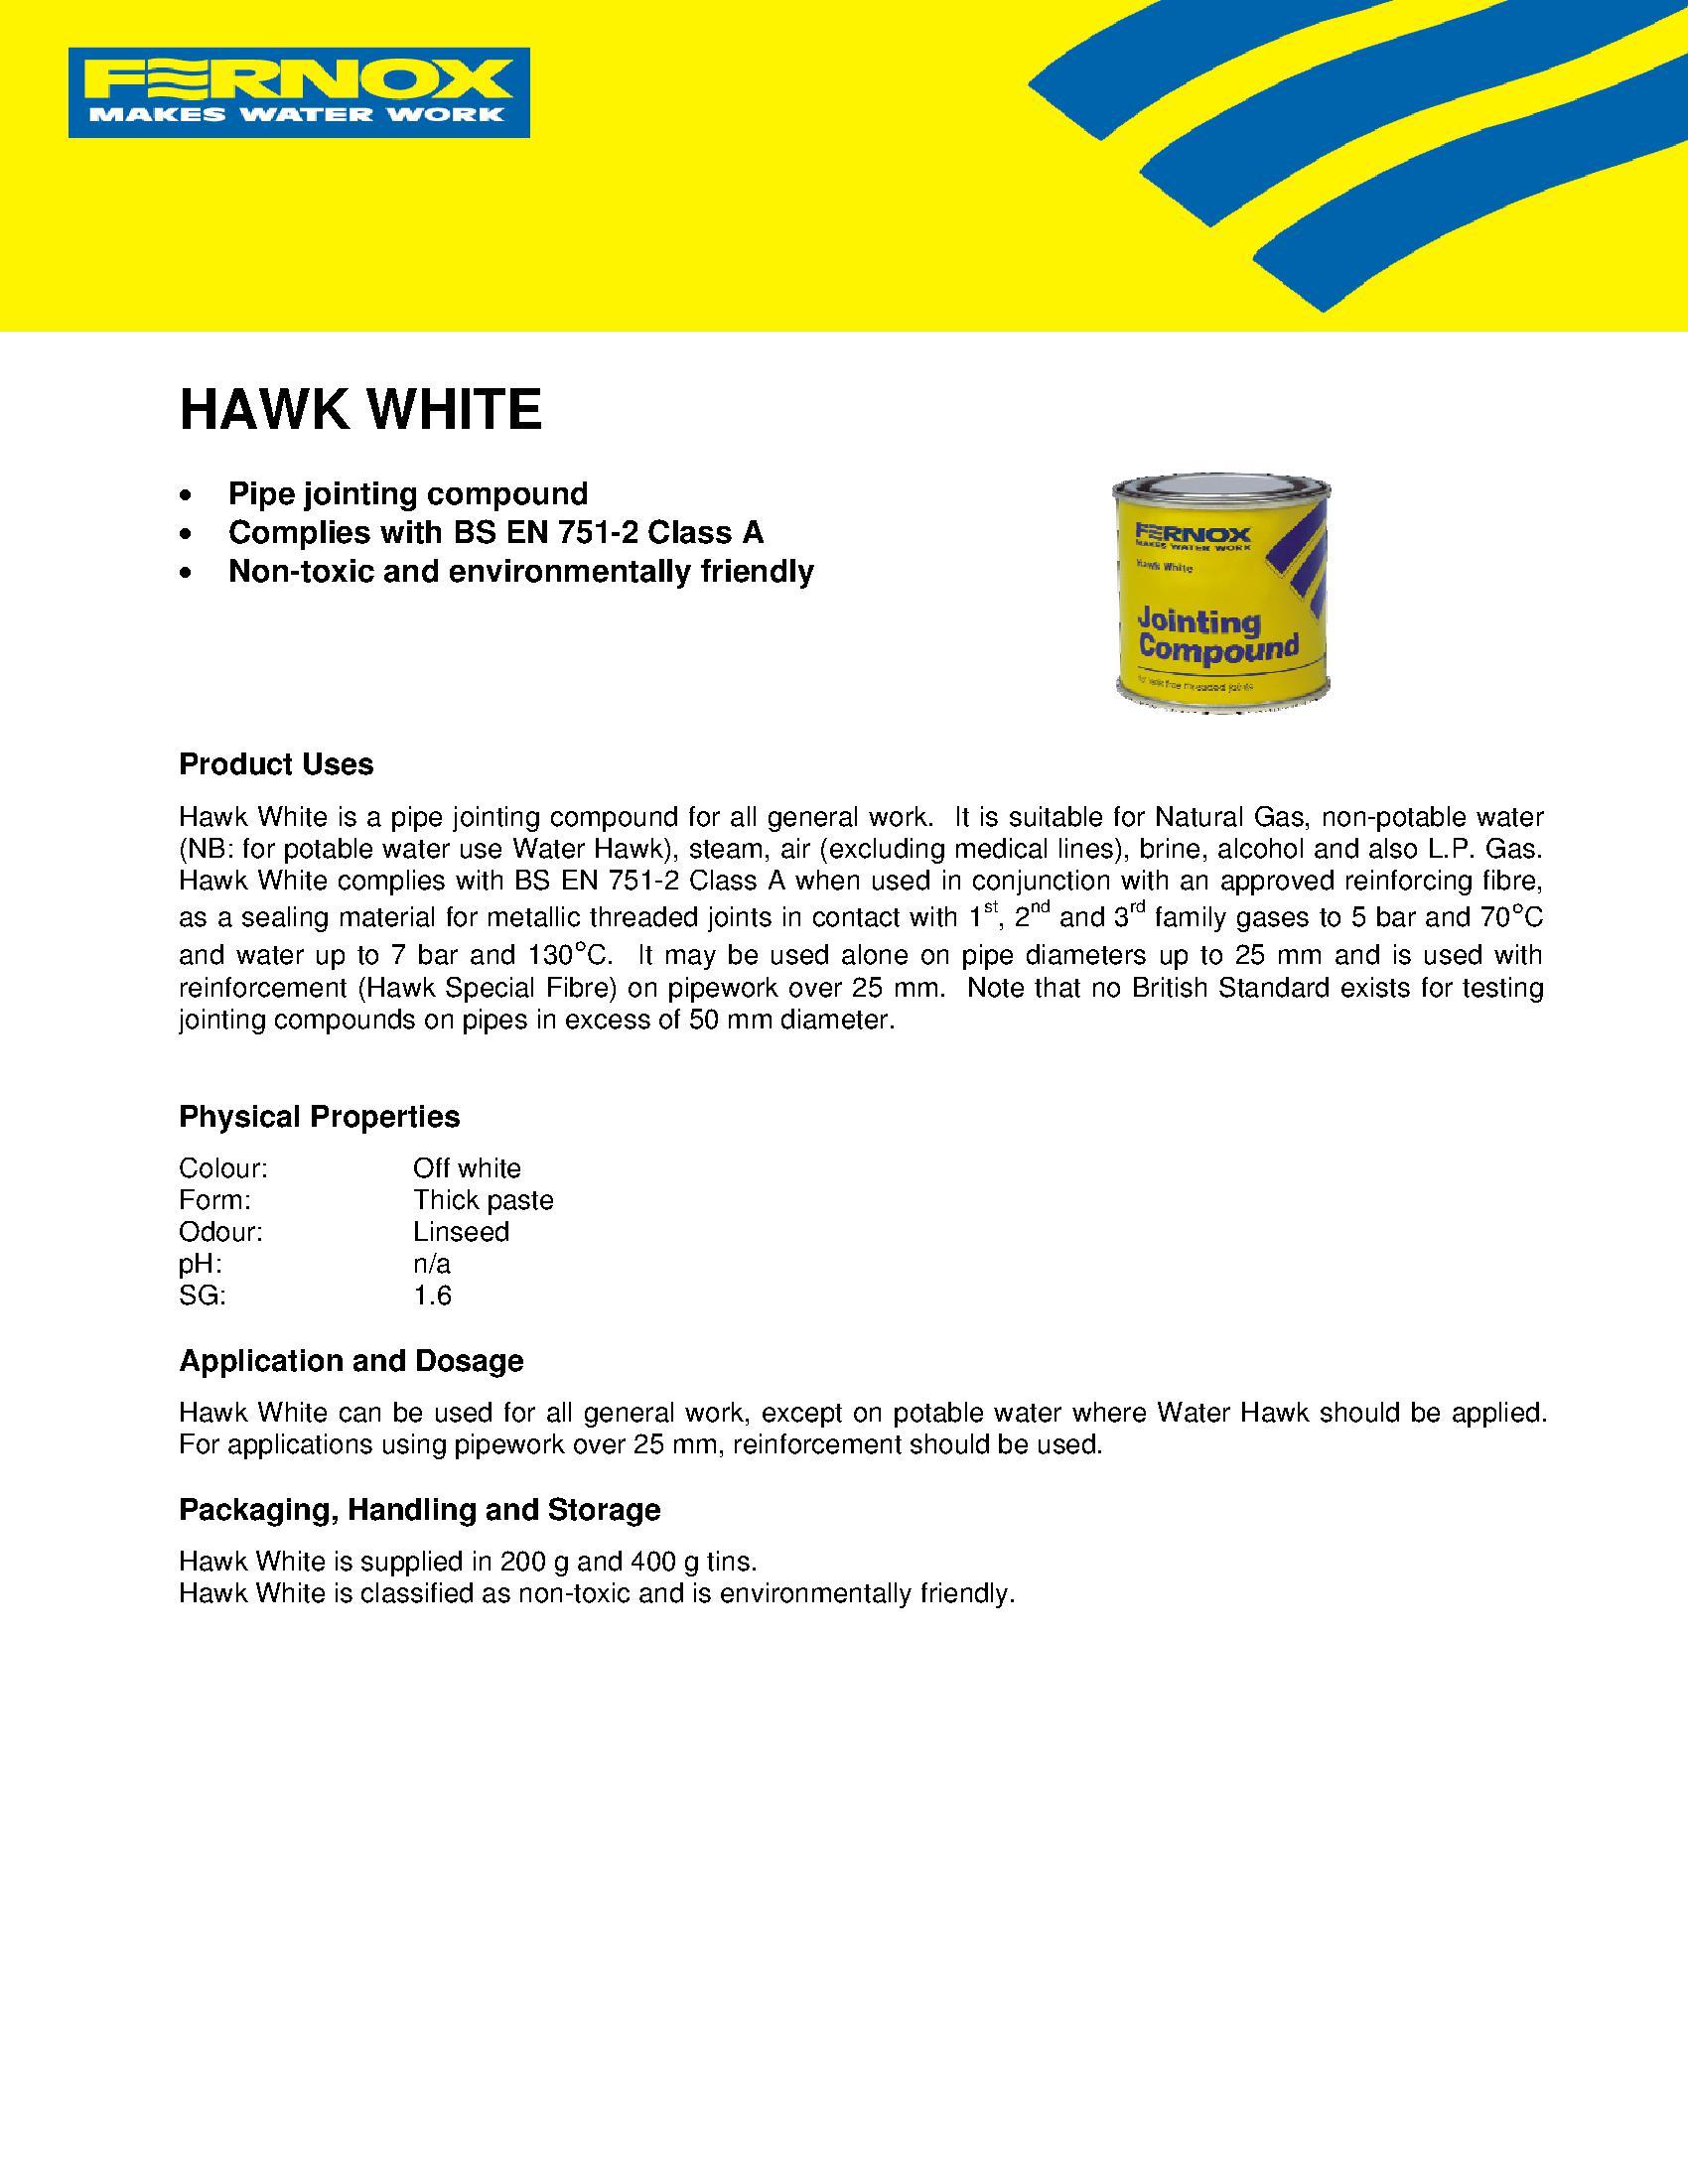 Fernox Hawk White PDF